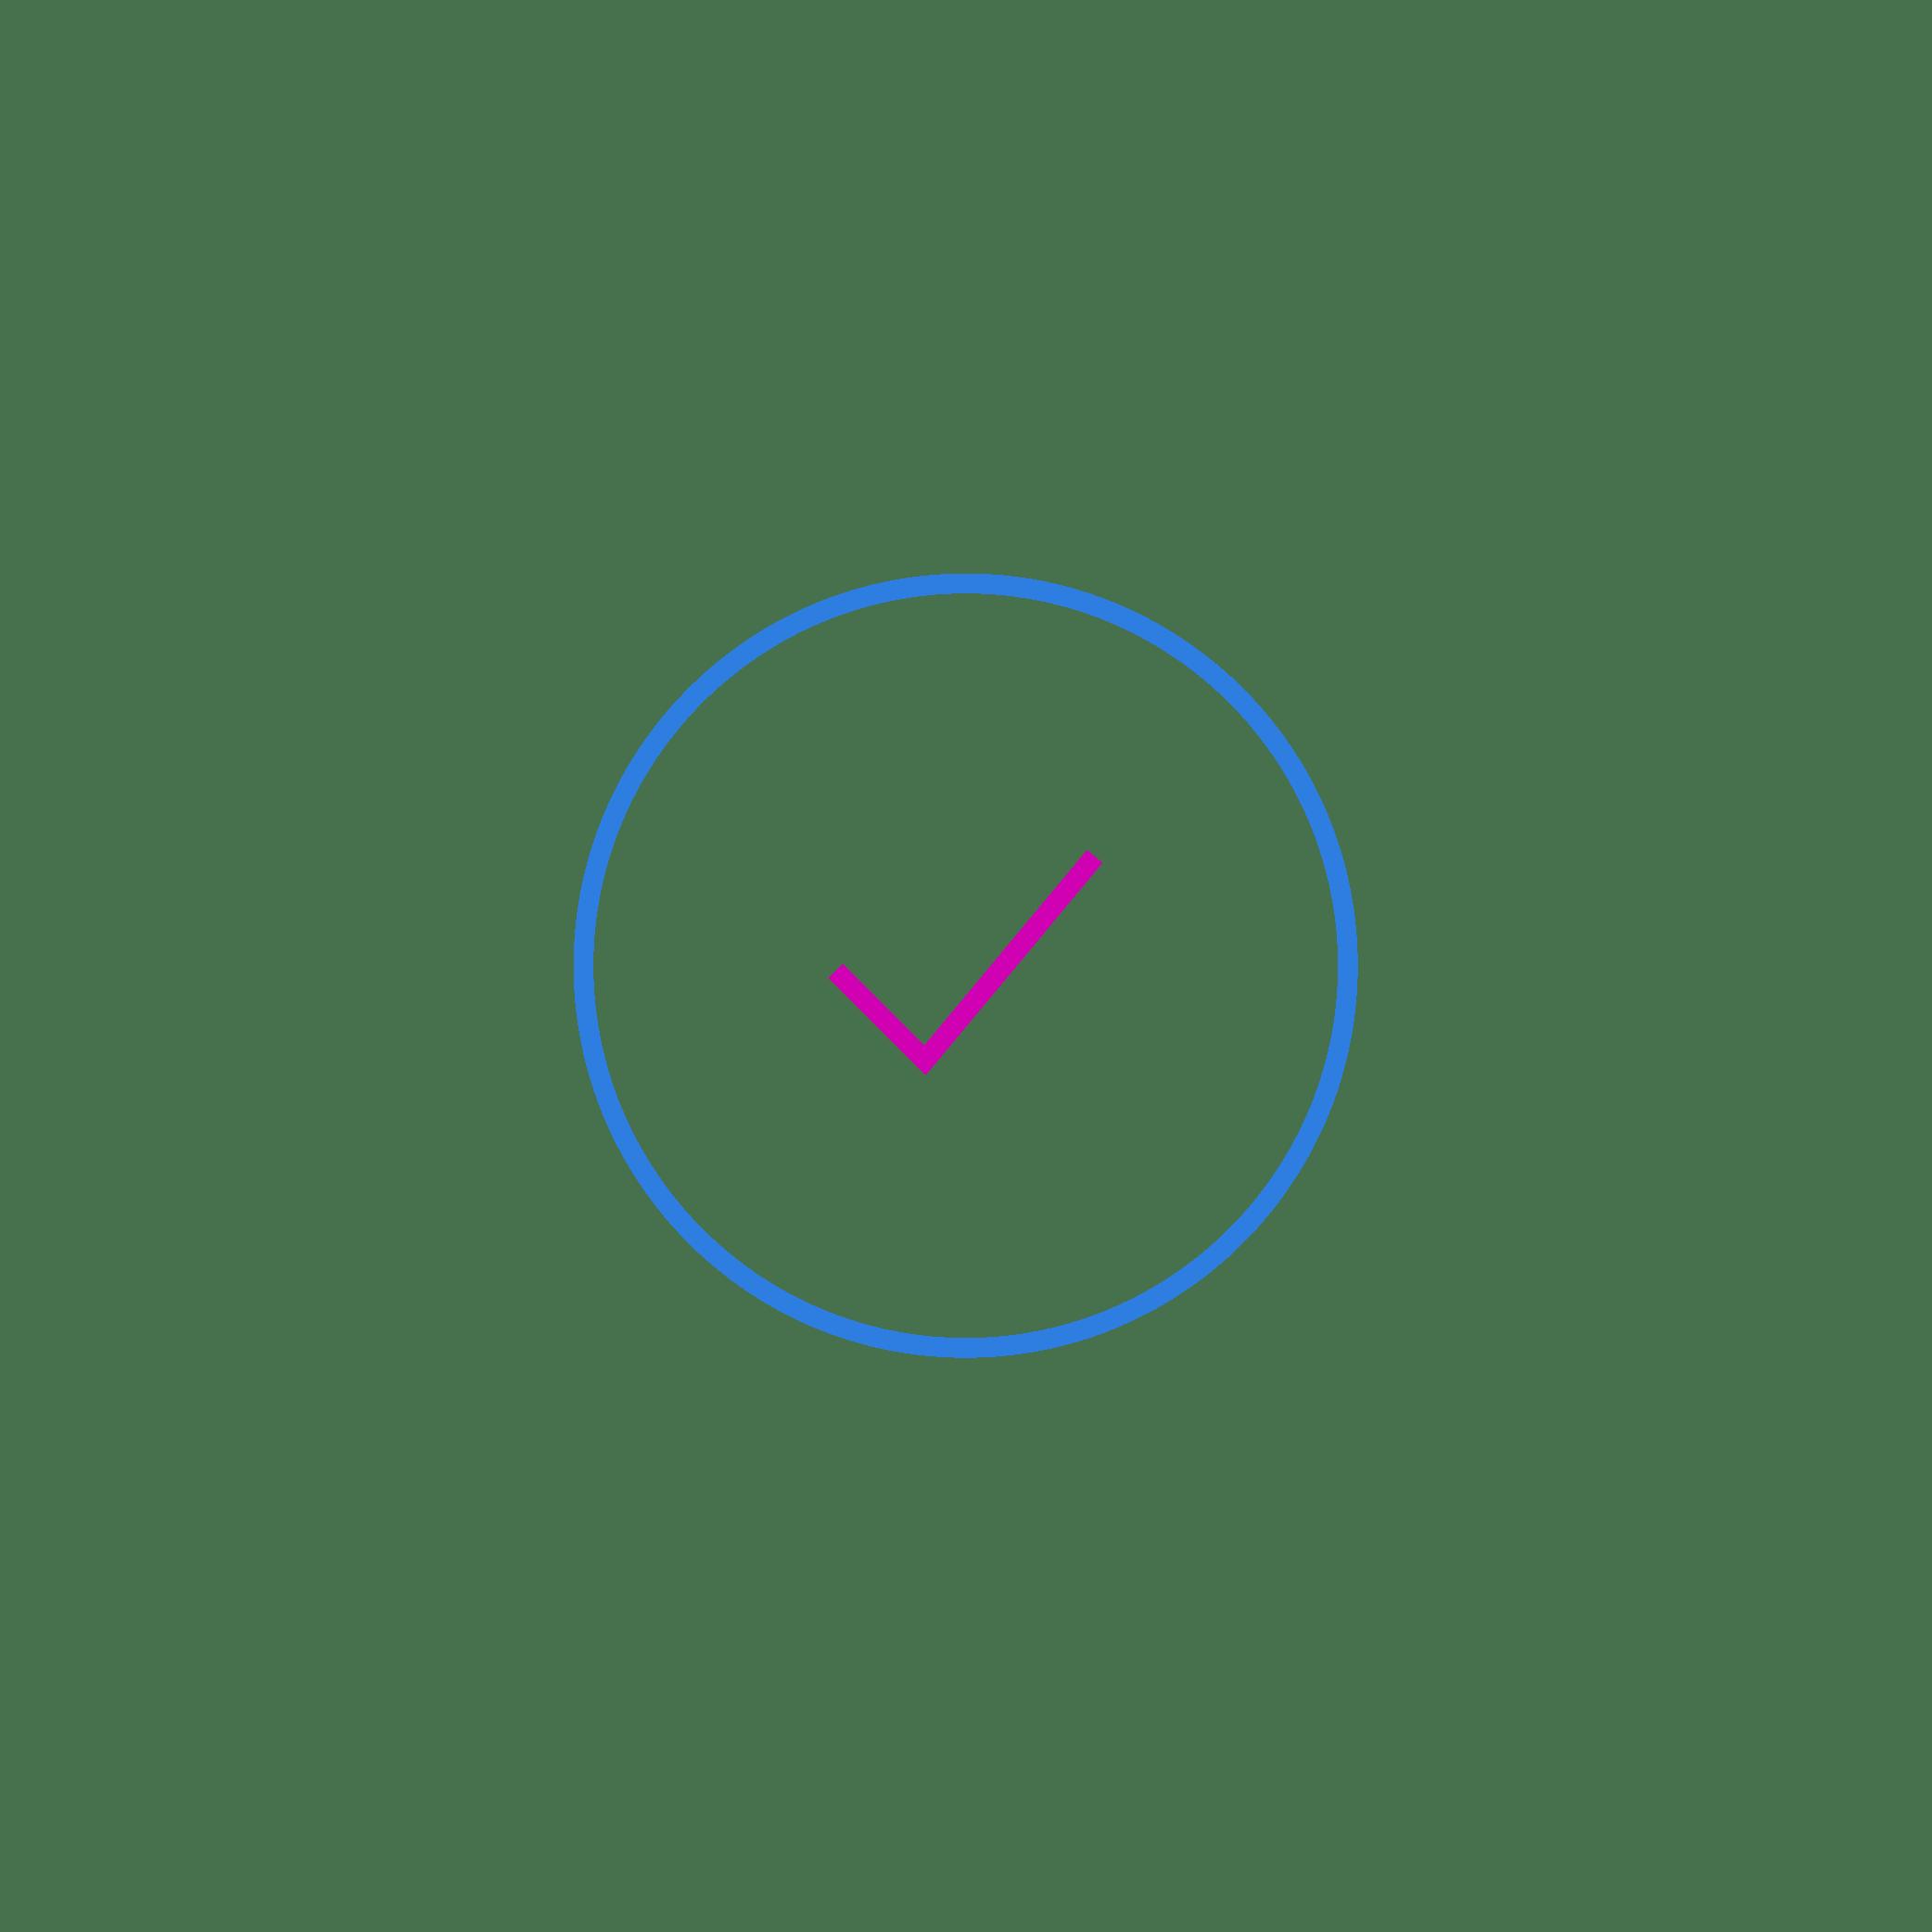 ico-etlinebcn_41-facil-accesible